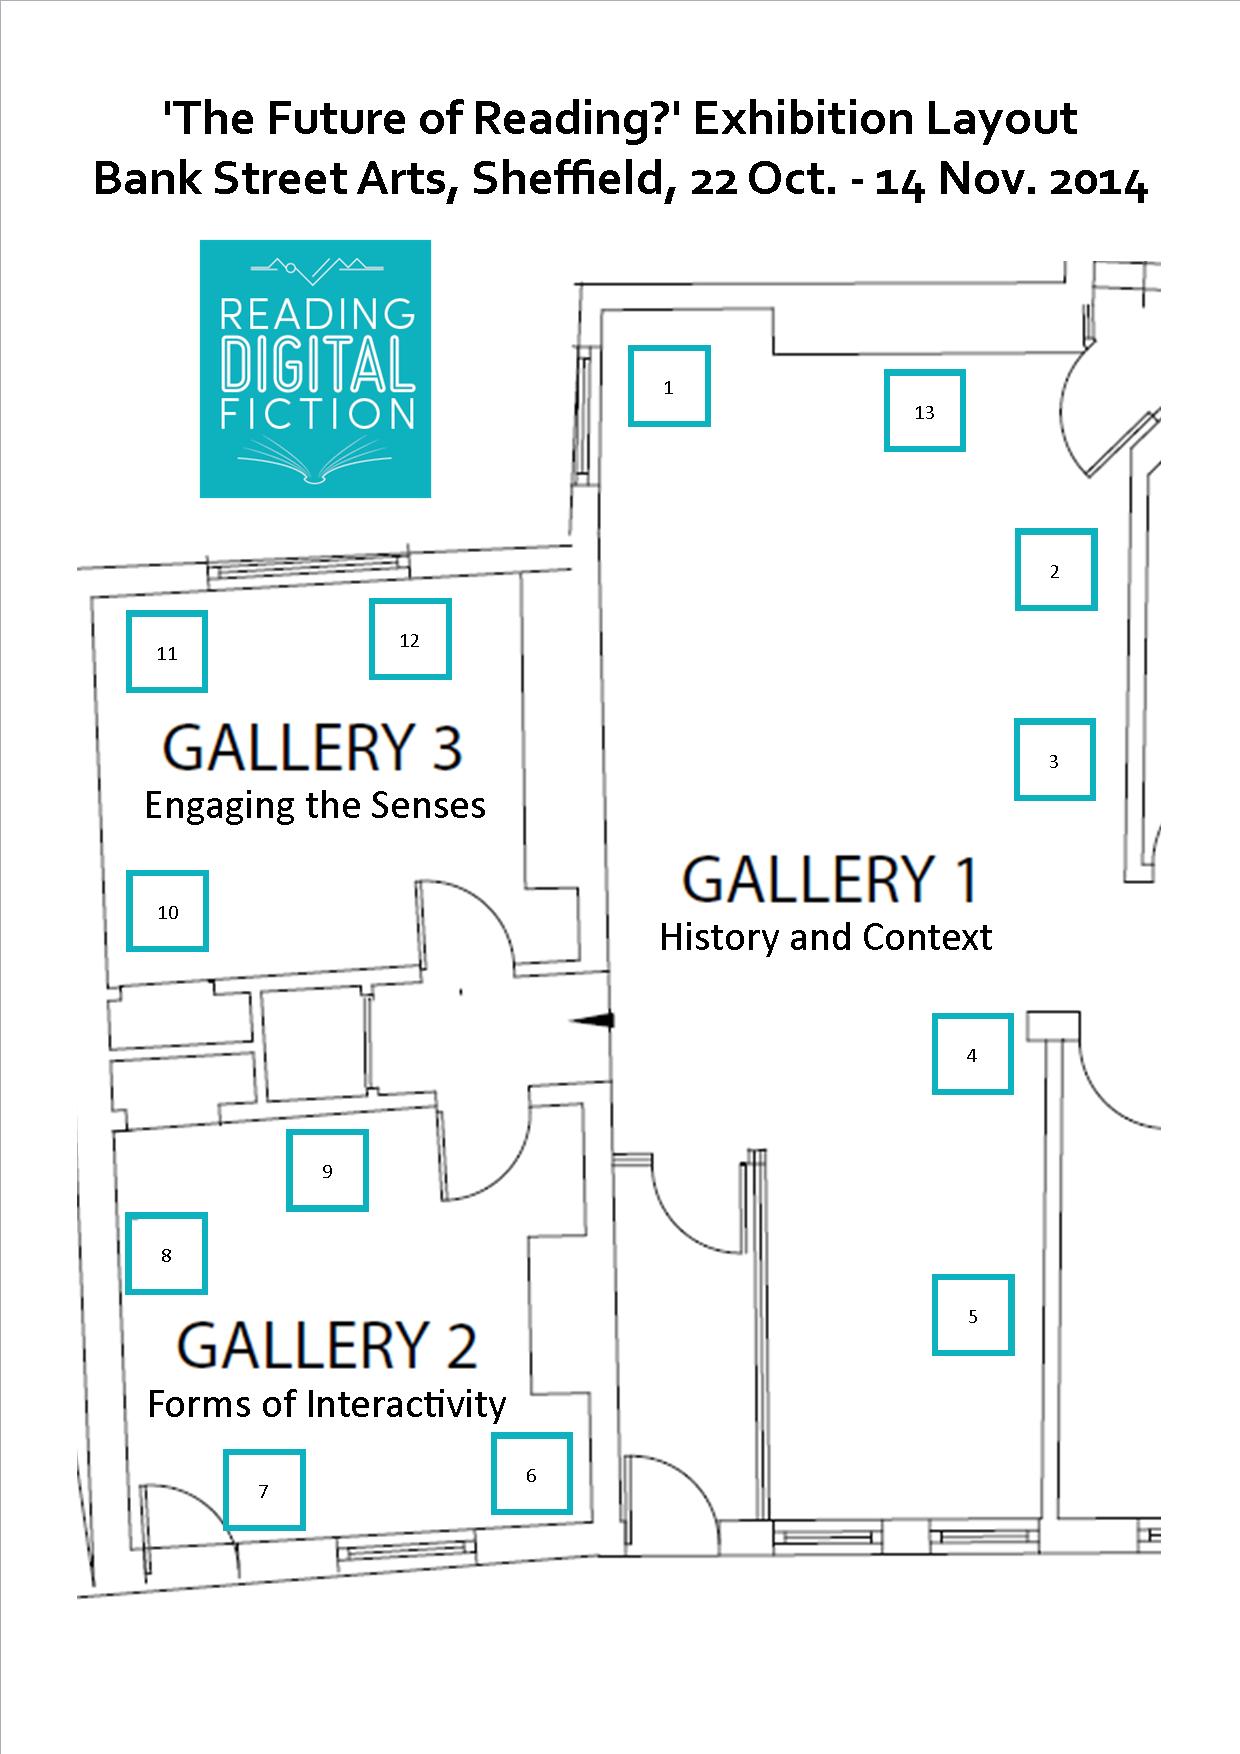 D Exhibition Floor Plan : Exhibition floor plan reading digital fiction